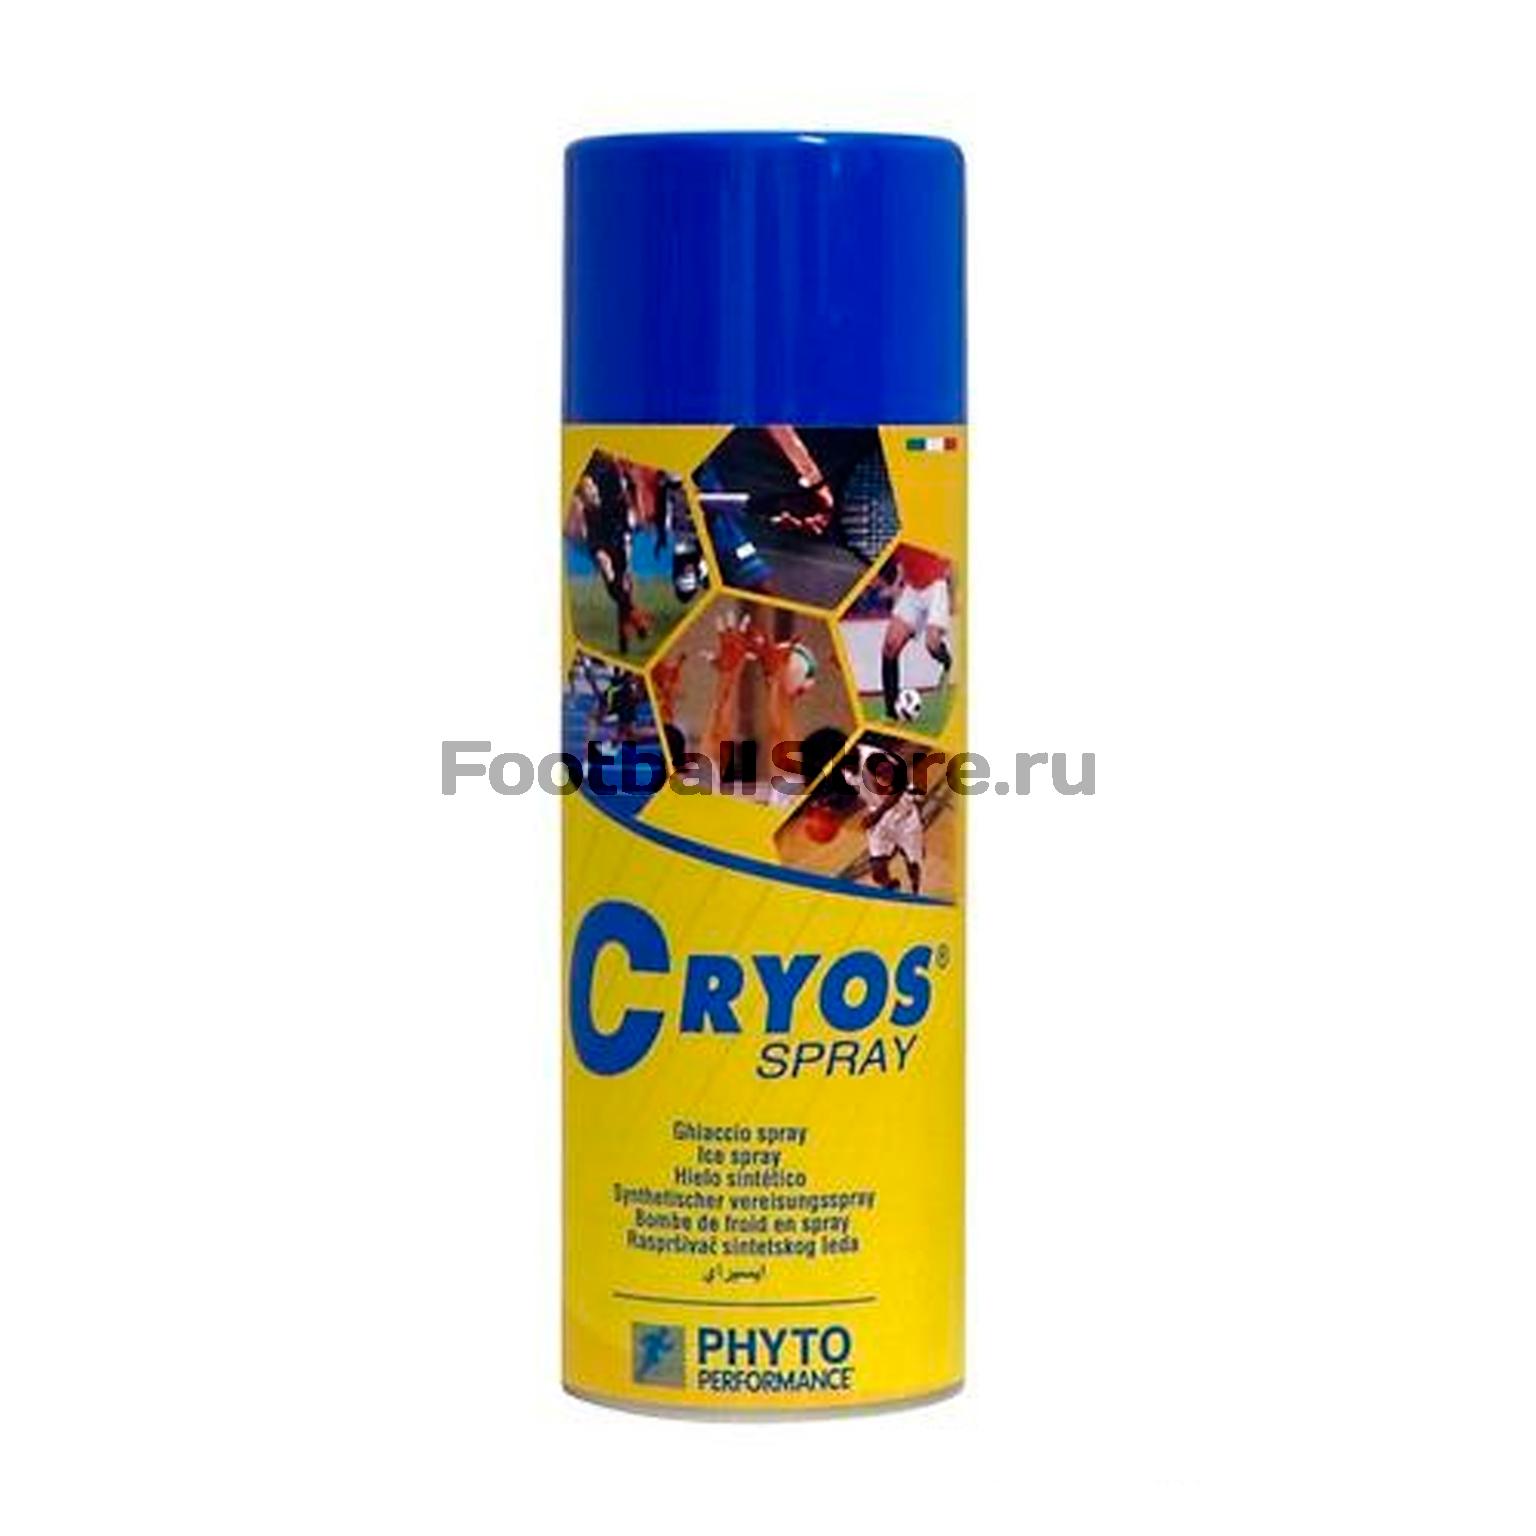 Медицина Mueller Замораживающий спрей Cryos-Spray 400мл. mueller mueller waist support